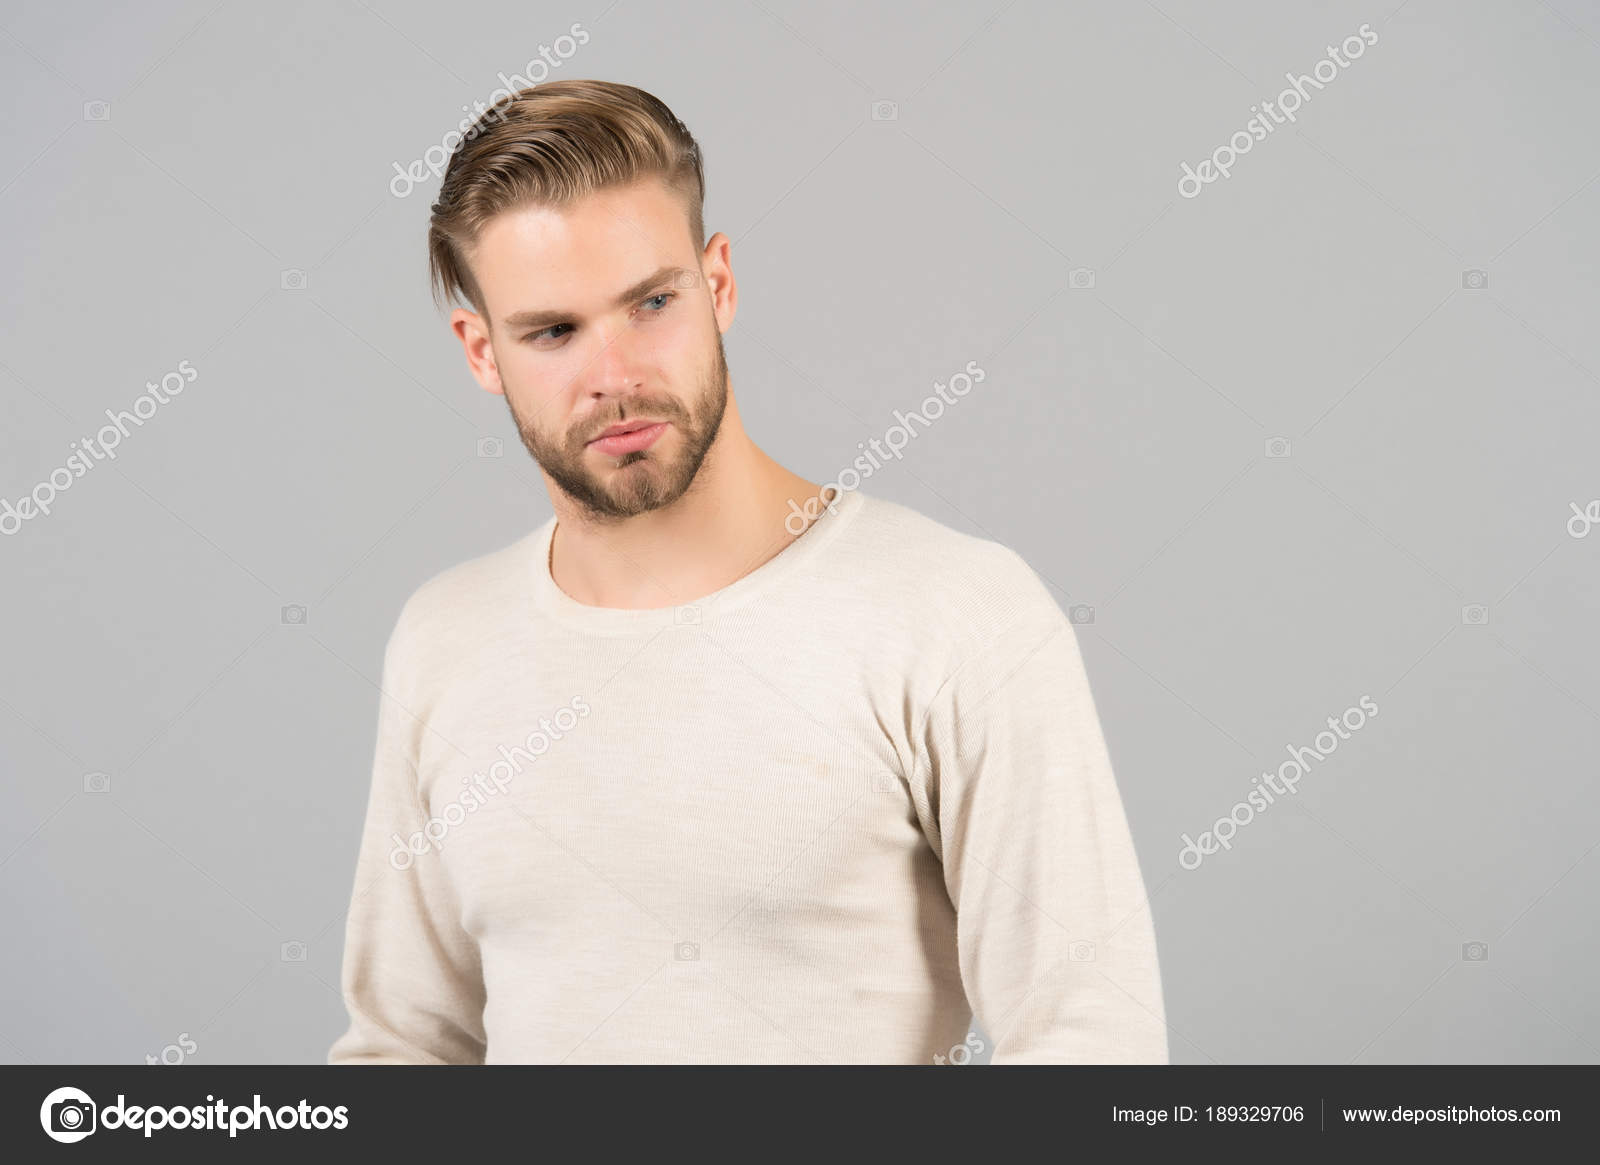 Cortes de pelo hombre rubio